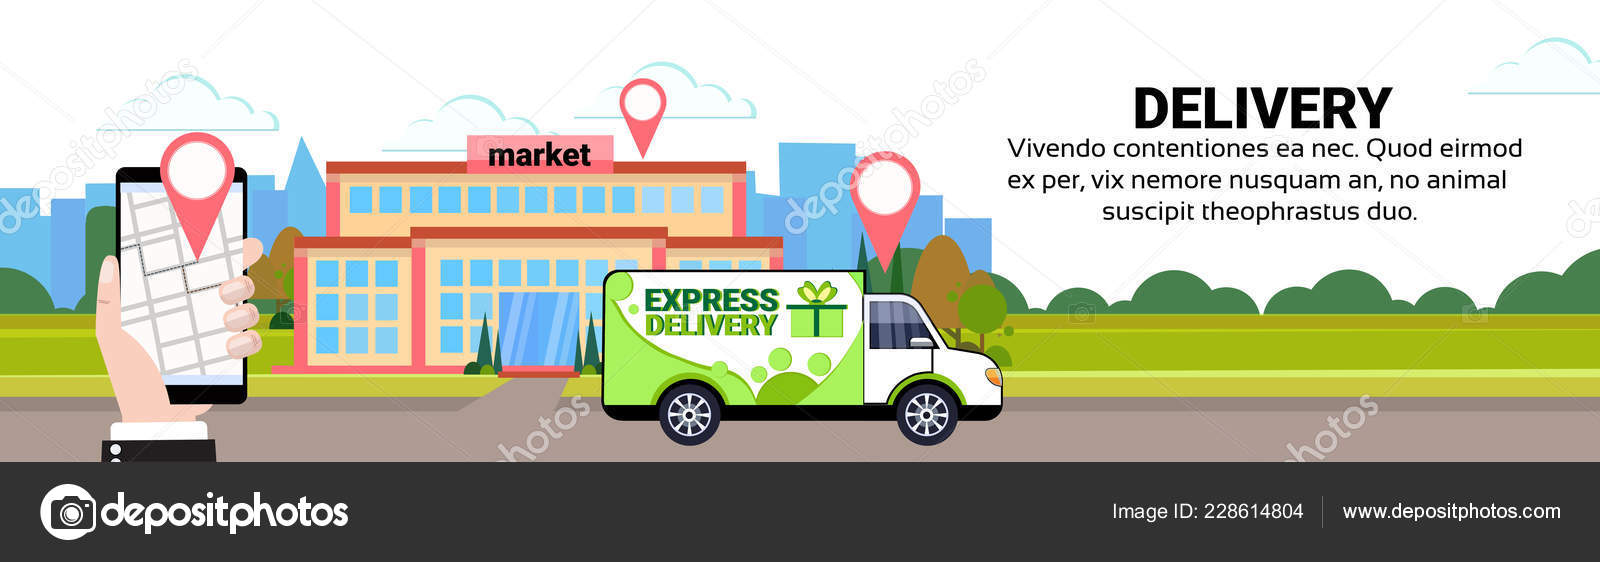 Mobile app cargo minivan delivery transport geo tag